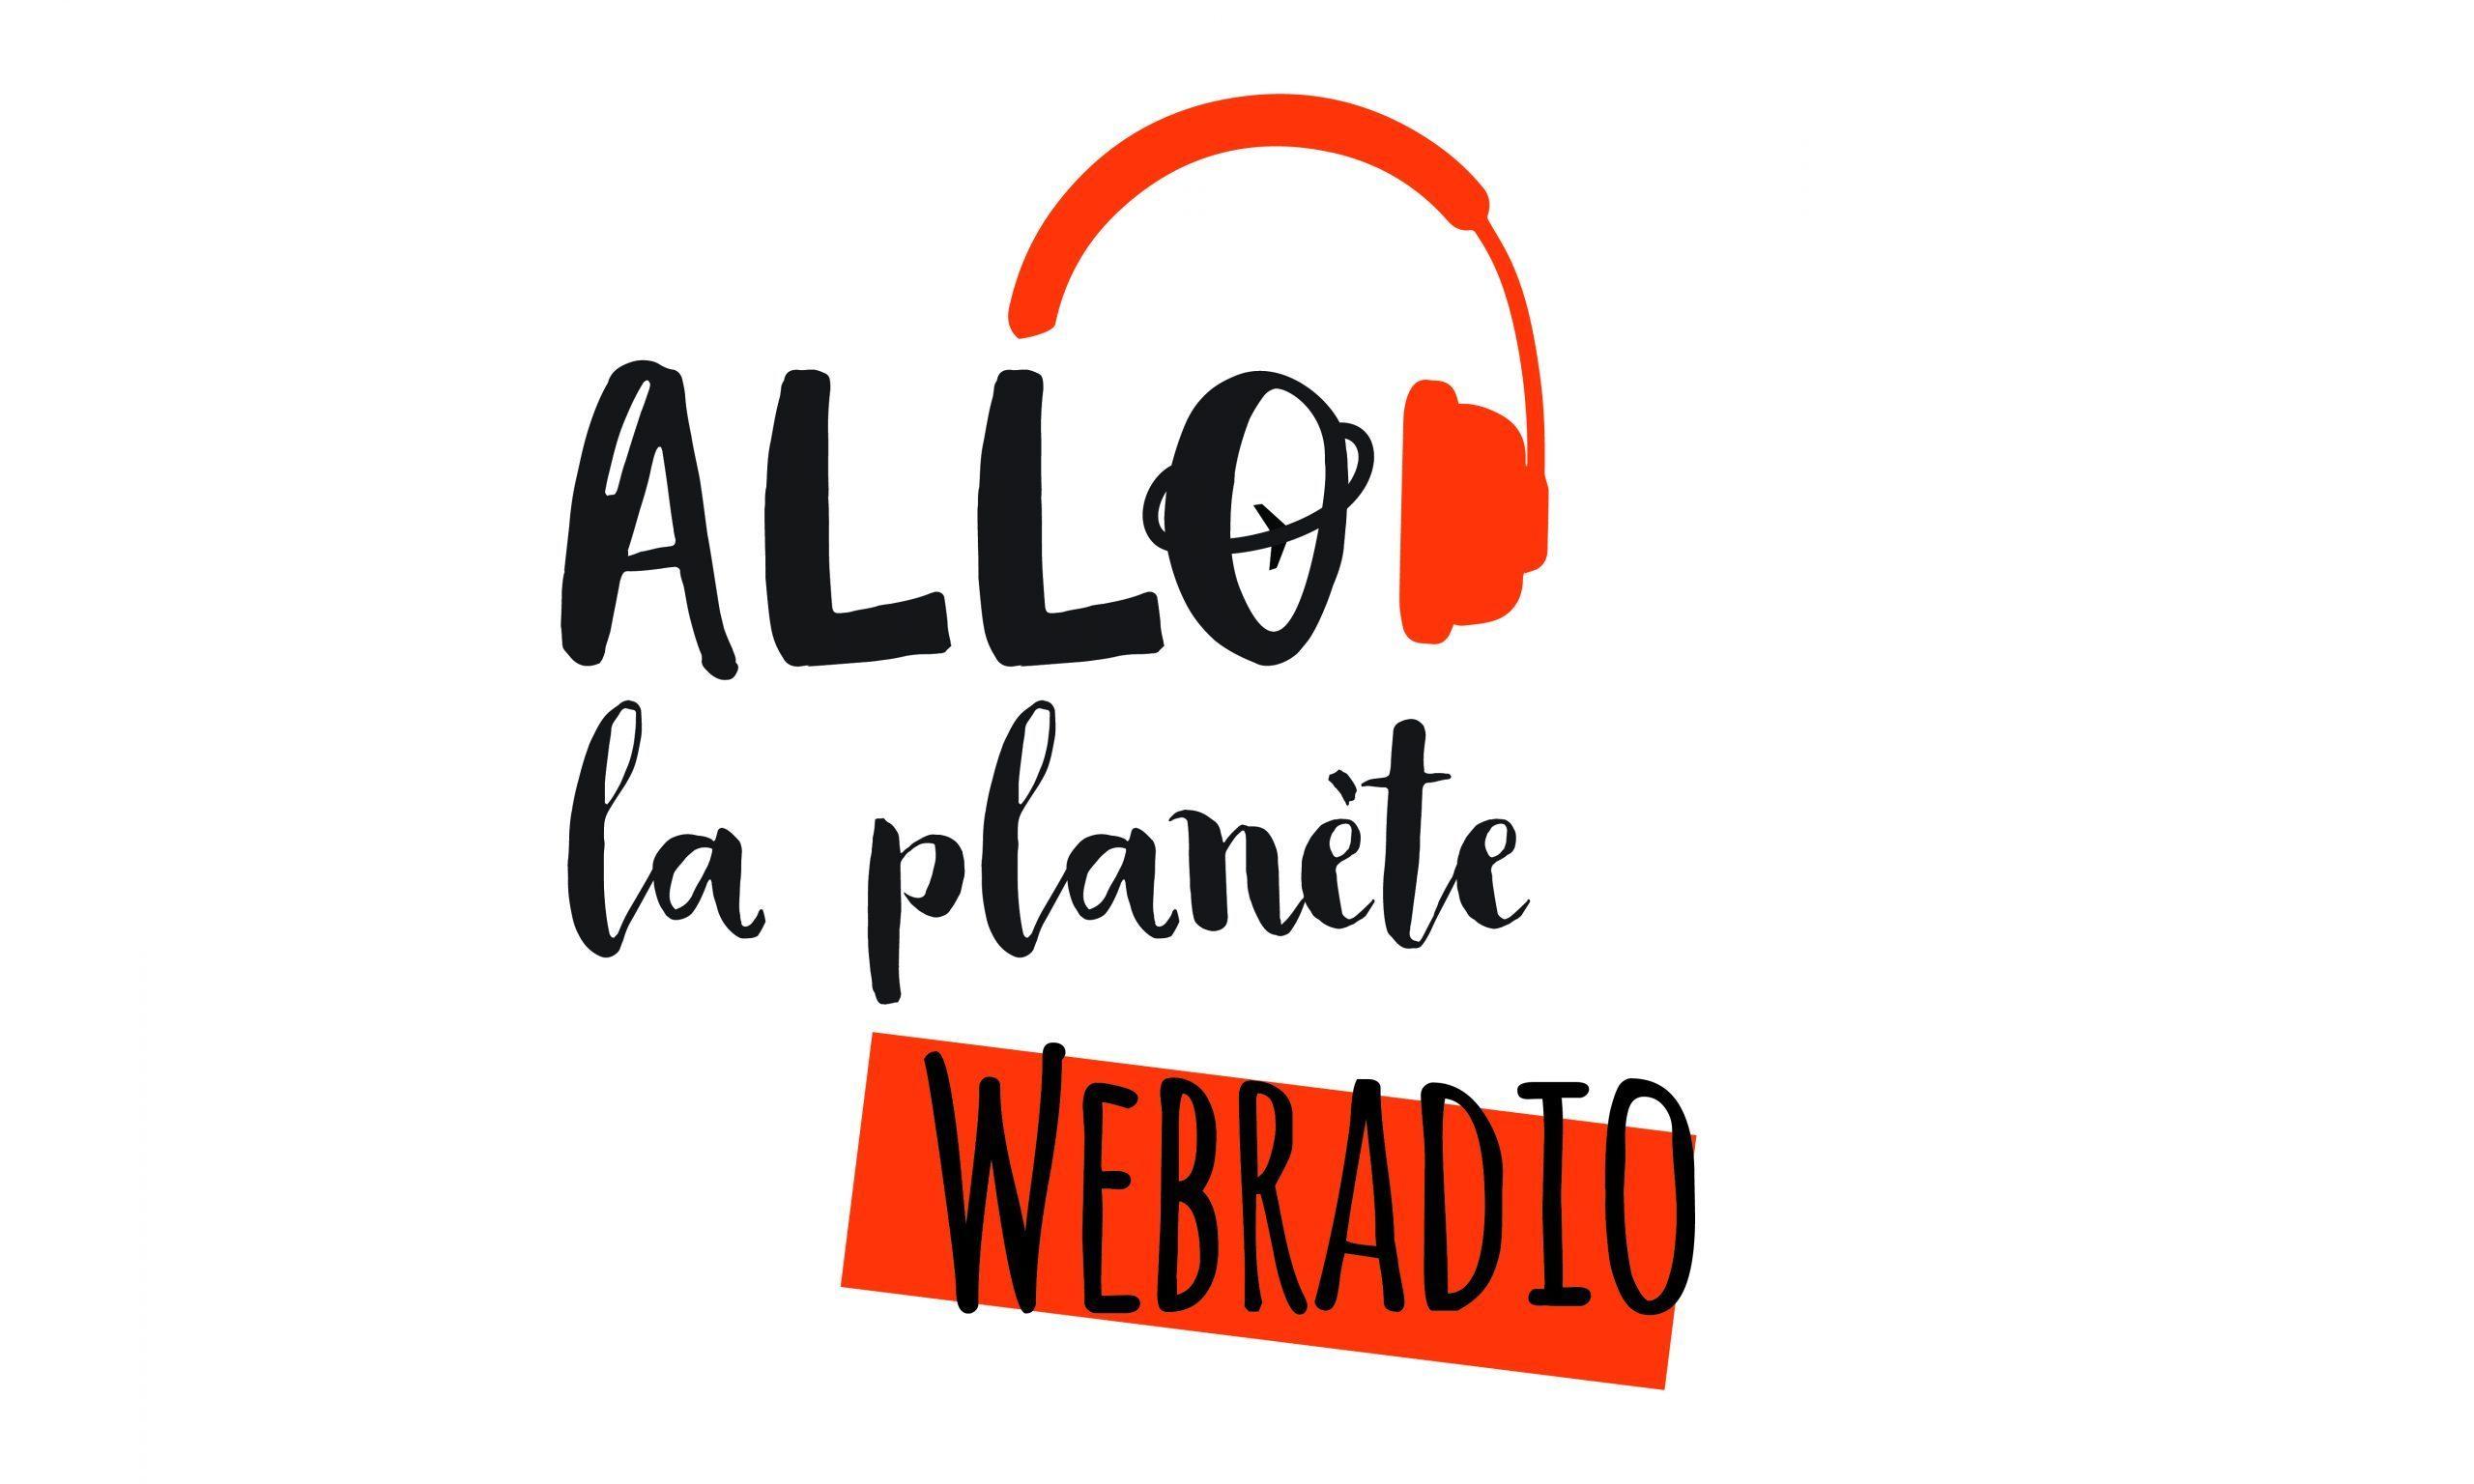 Webradio Allo la Planete